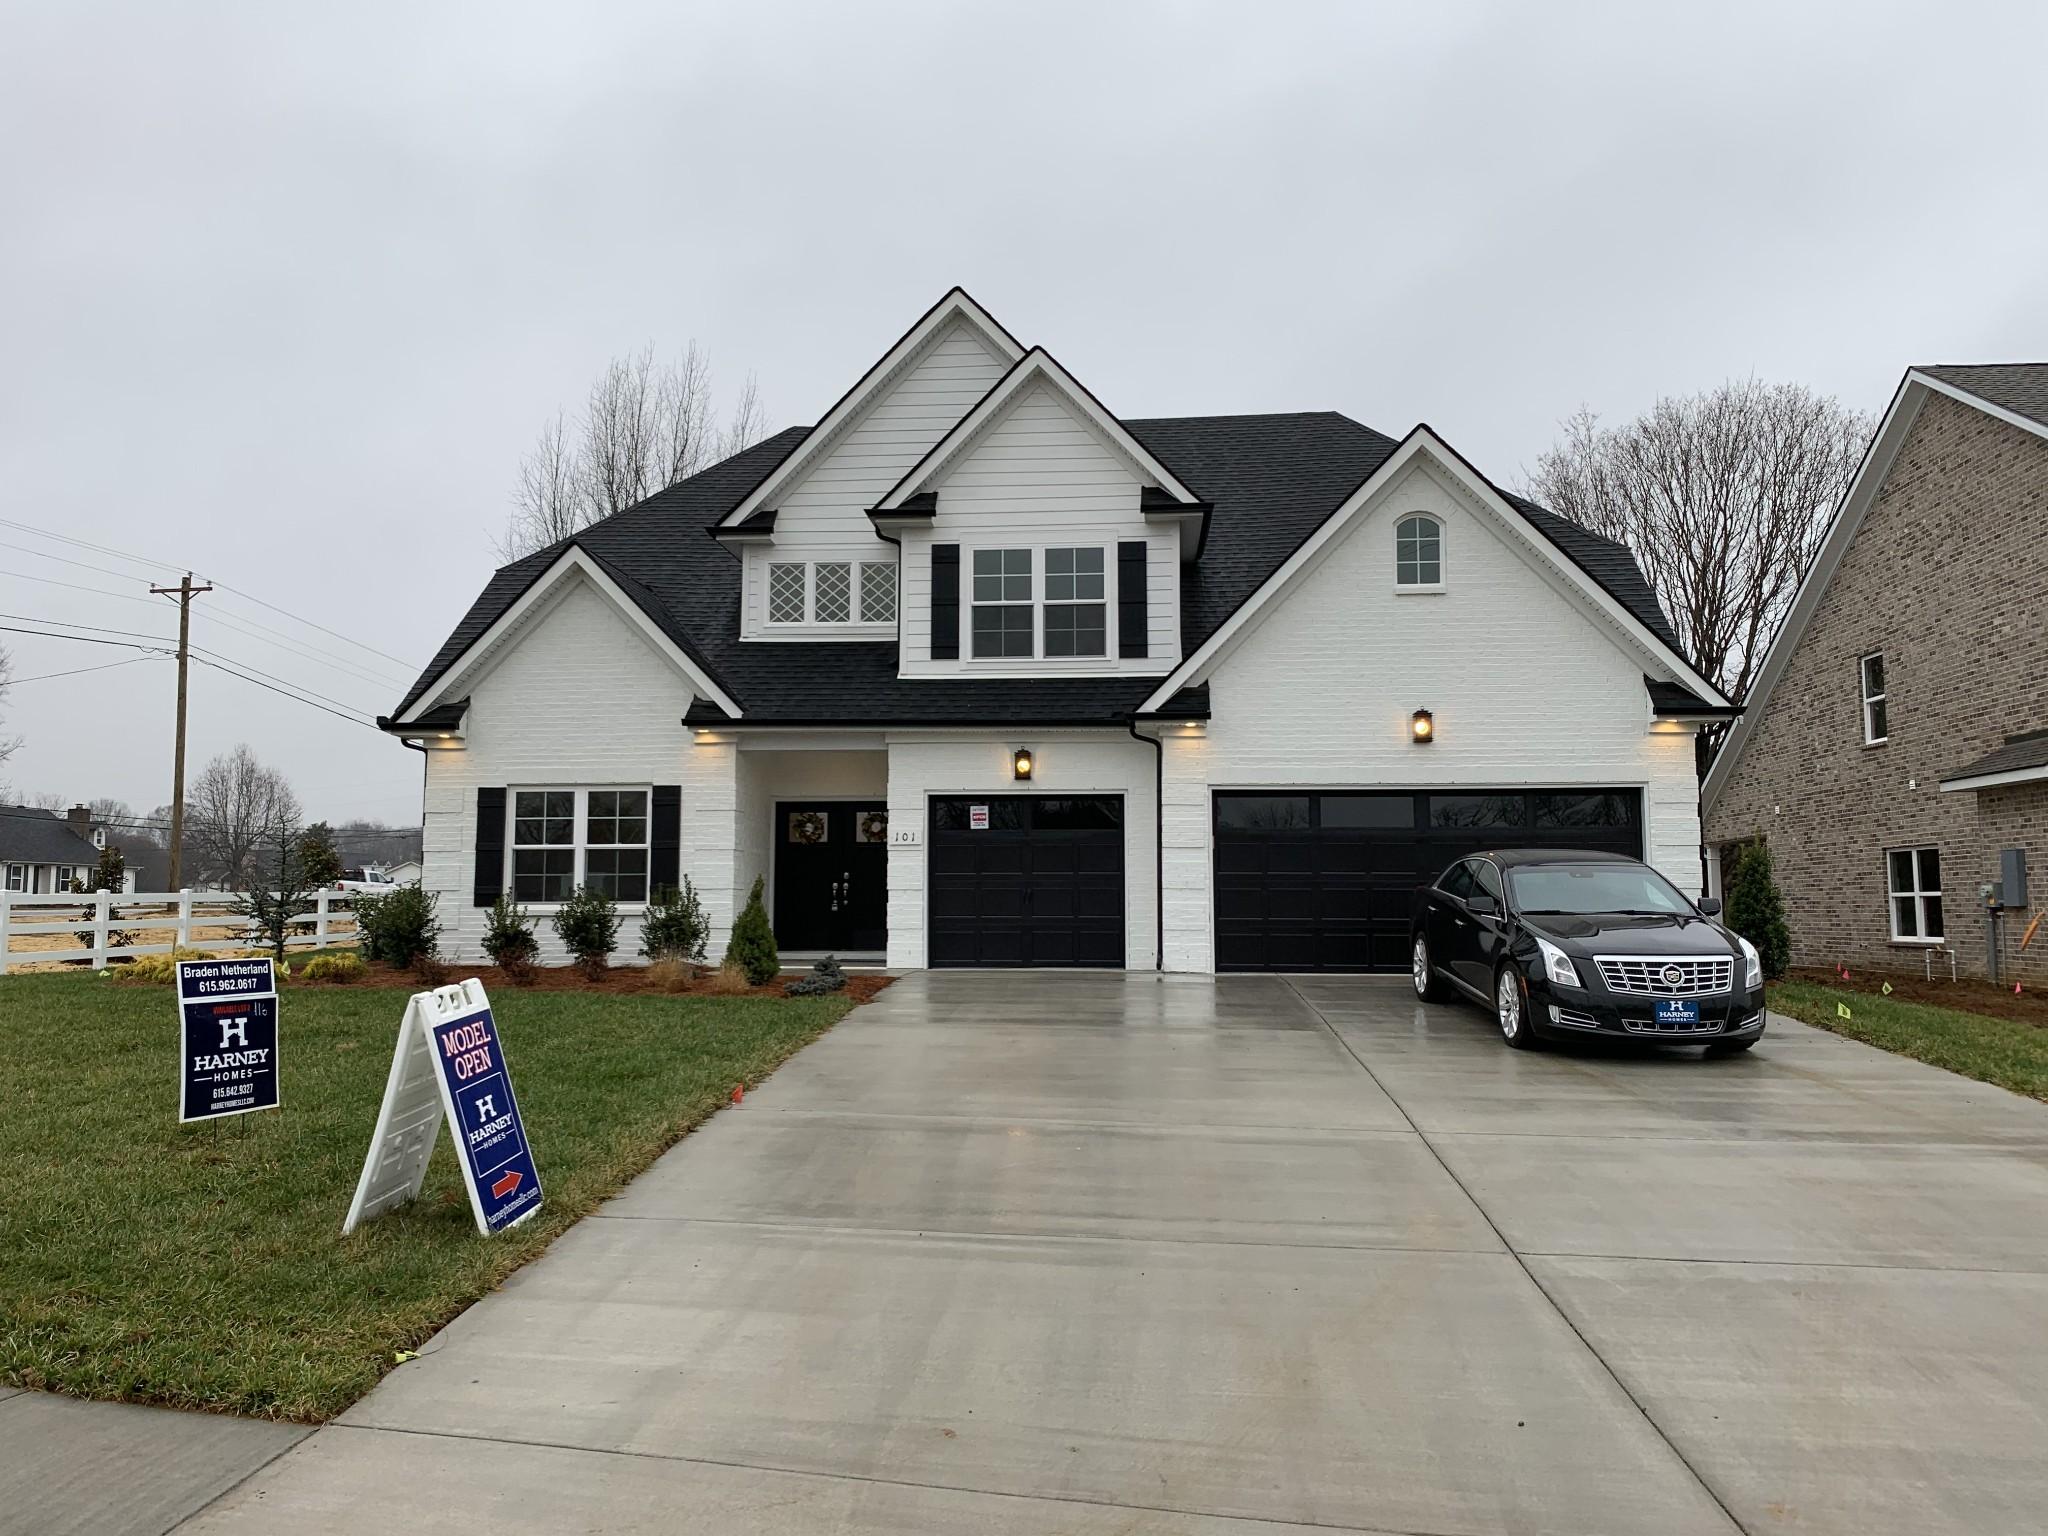 101 Beulah Rose Drive Lot 116, Murfreesboro, TN 37128 - Murfreesboro, TN real estate listing